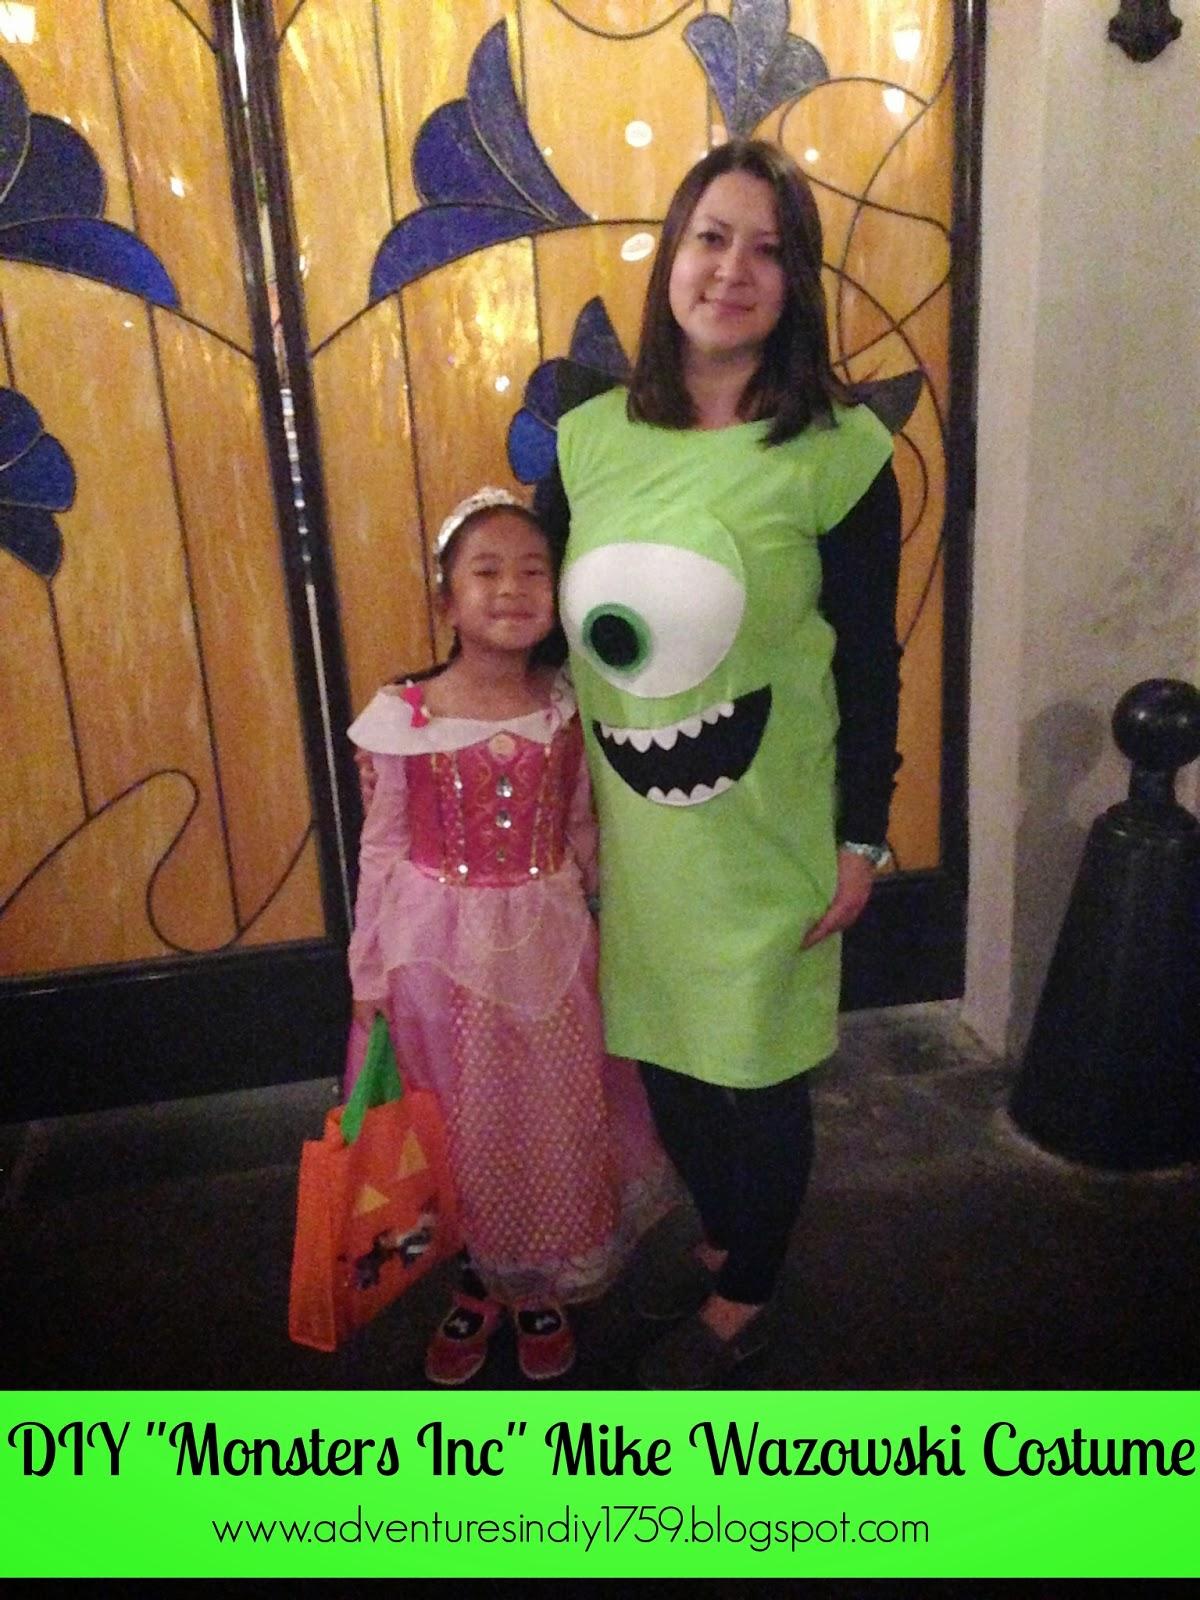 Adventures In Diy Diy Monsters Inc Mike Wazowski Costume